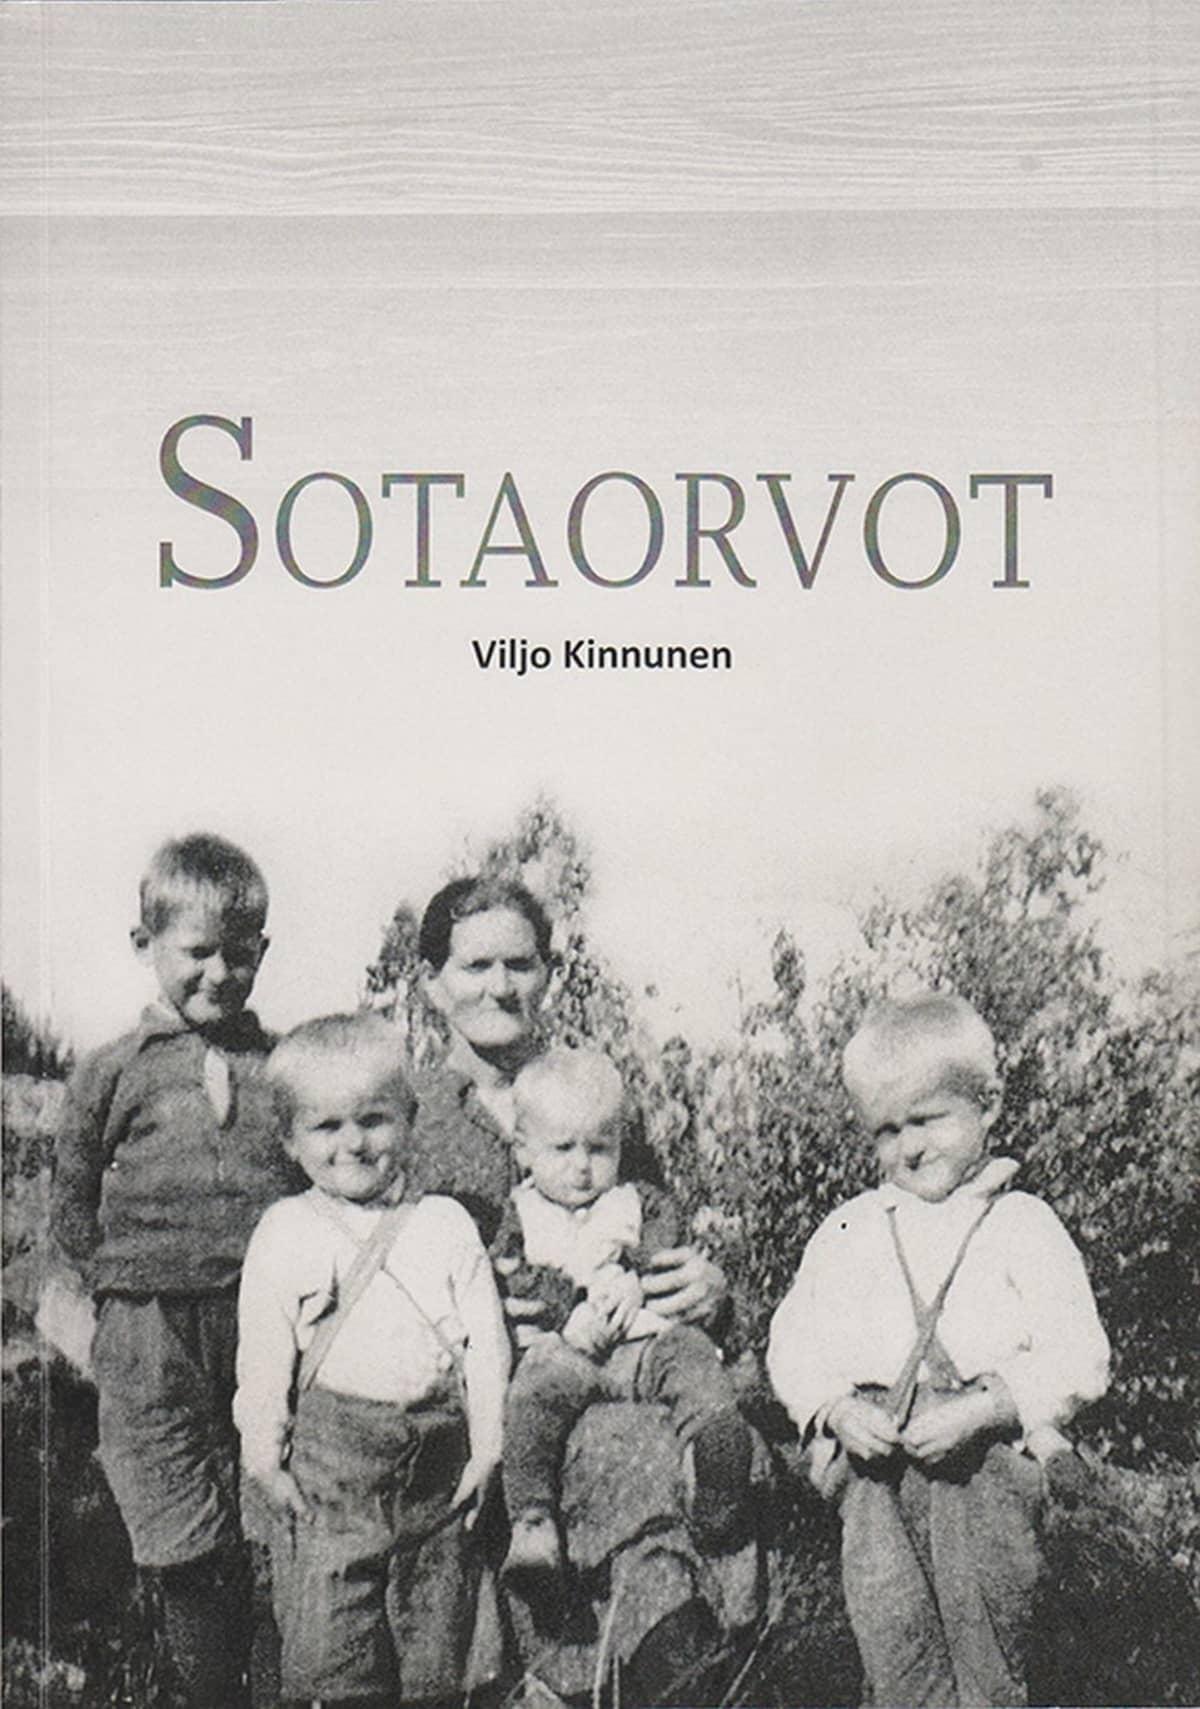 Viljo Kinnunen: Sotaorvot -kirjan kansi